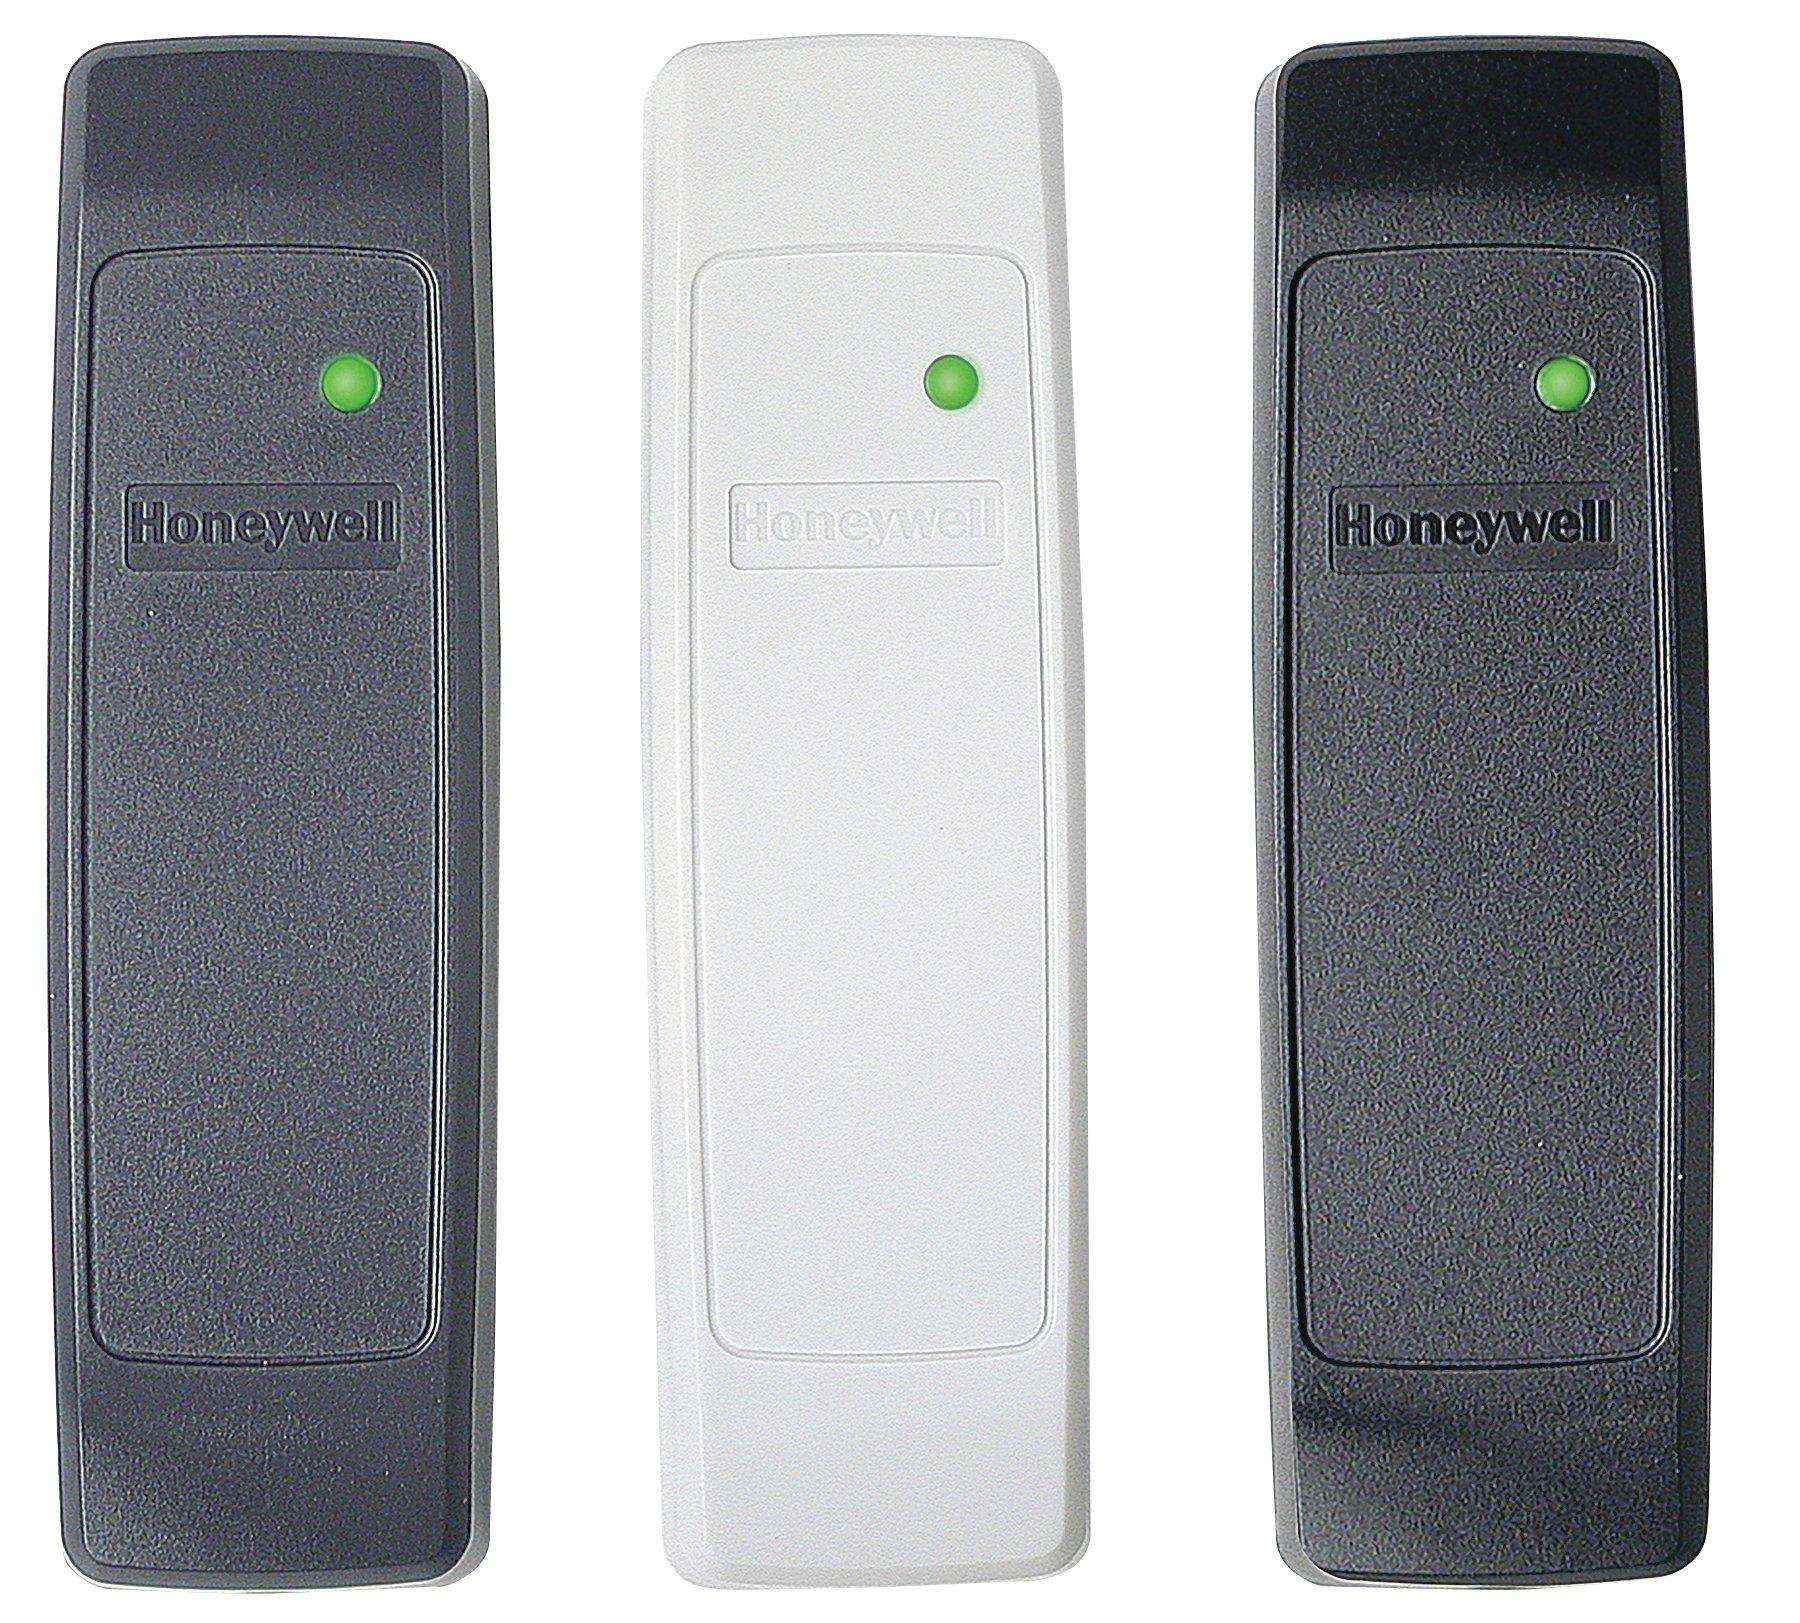 Honeywell Access Control